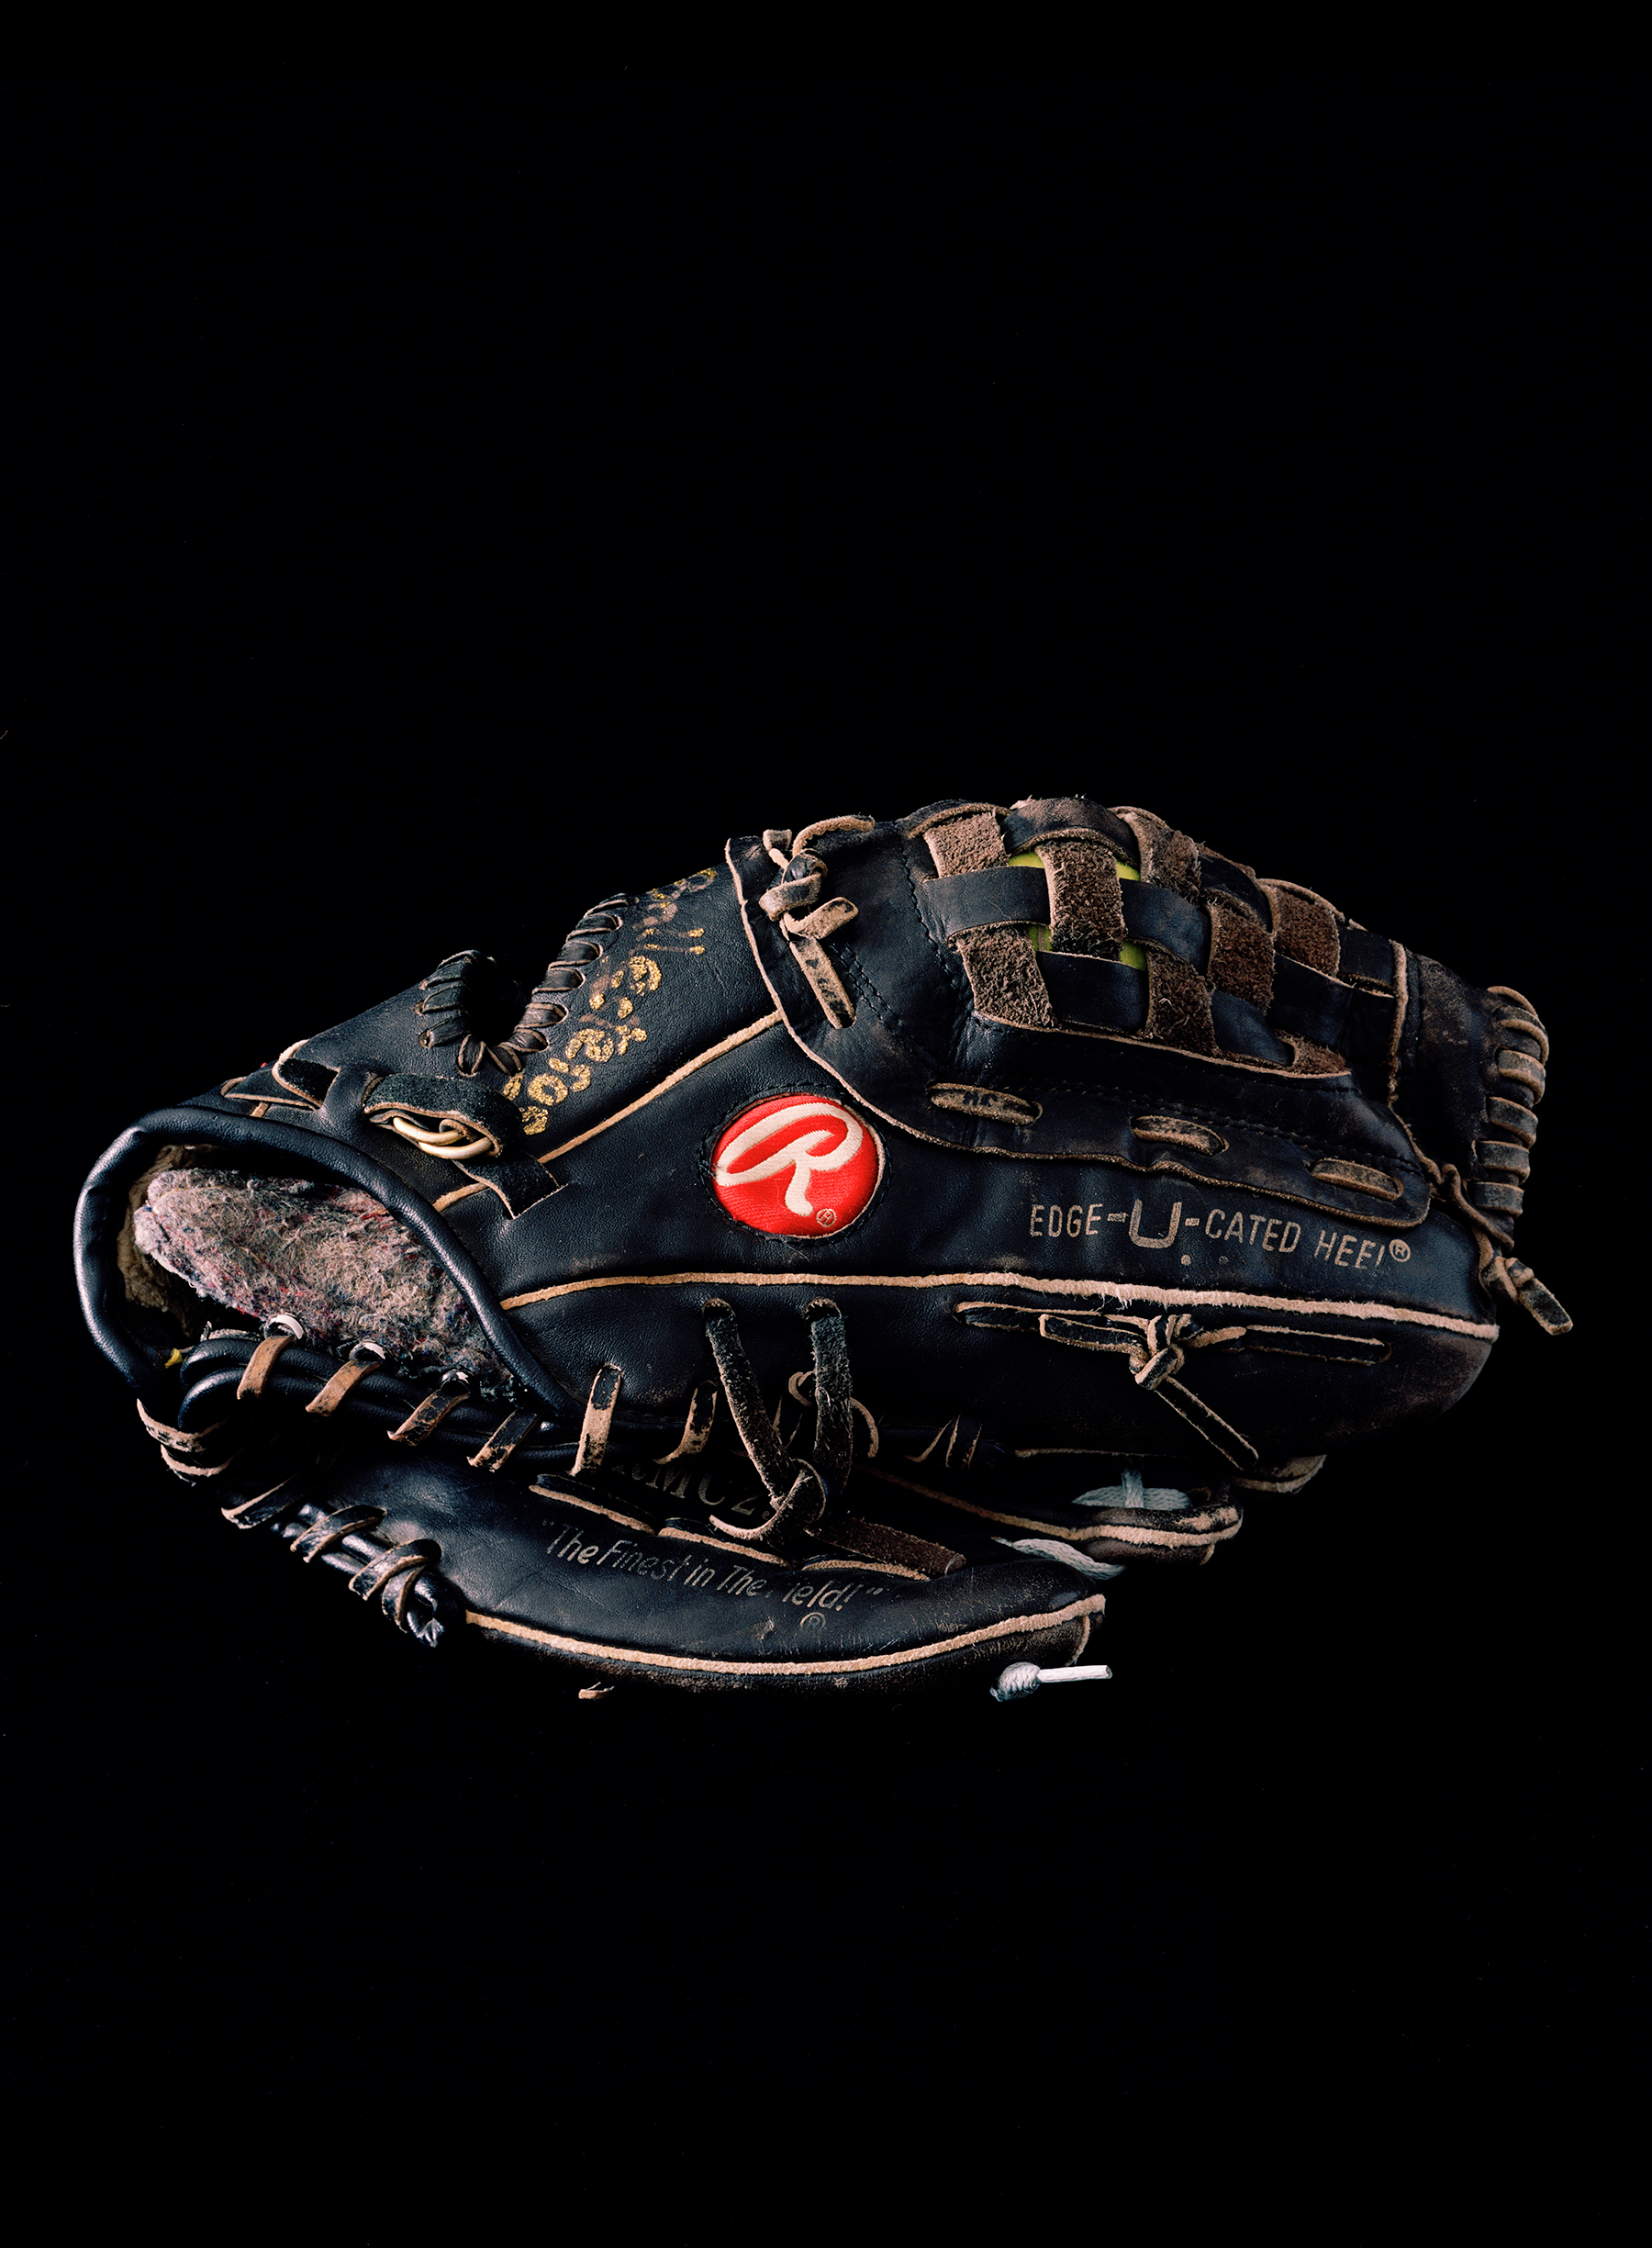 Culture Handbook No. 014 (baseball glove), 2017